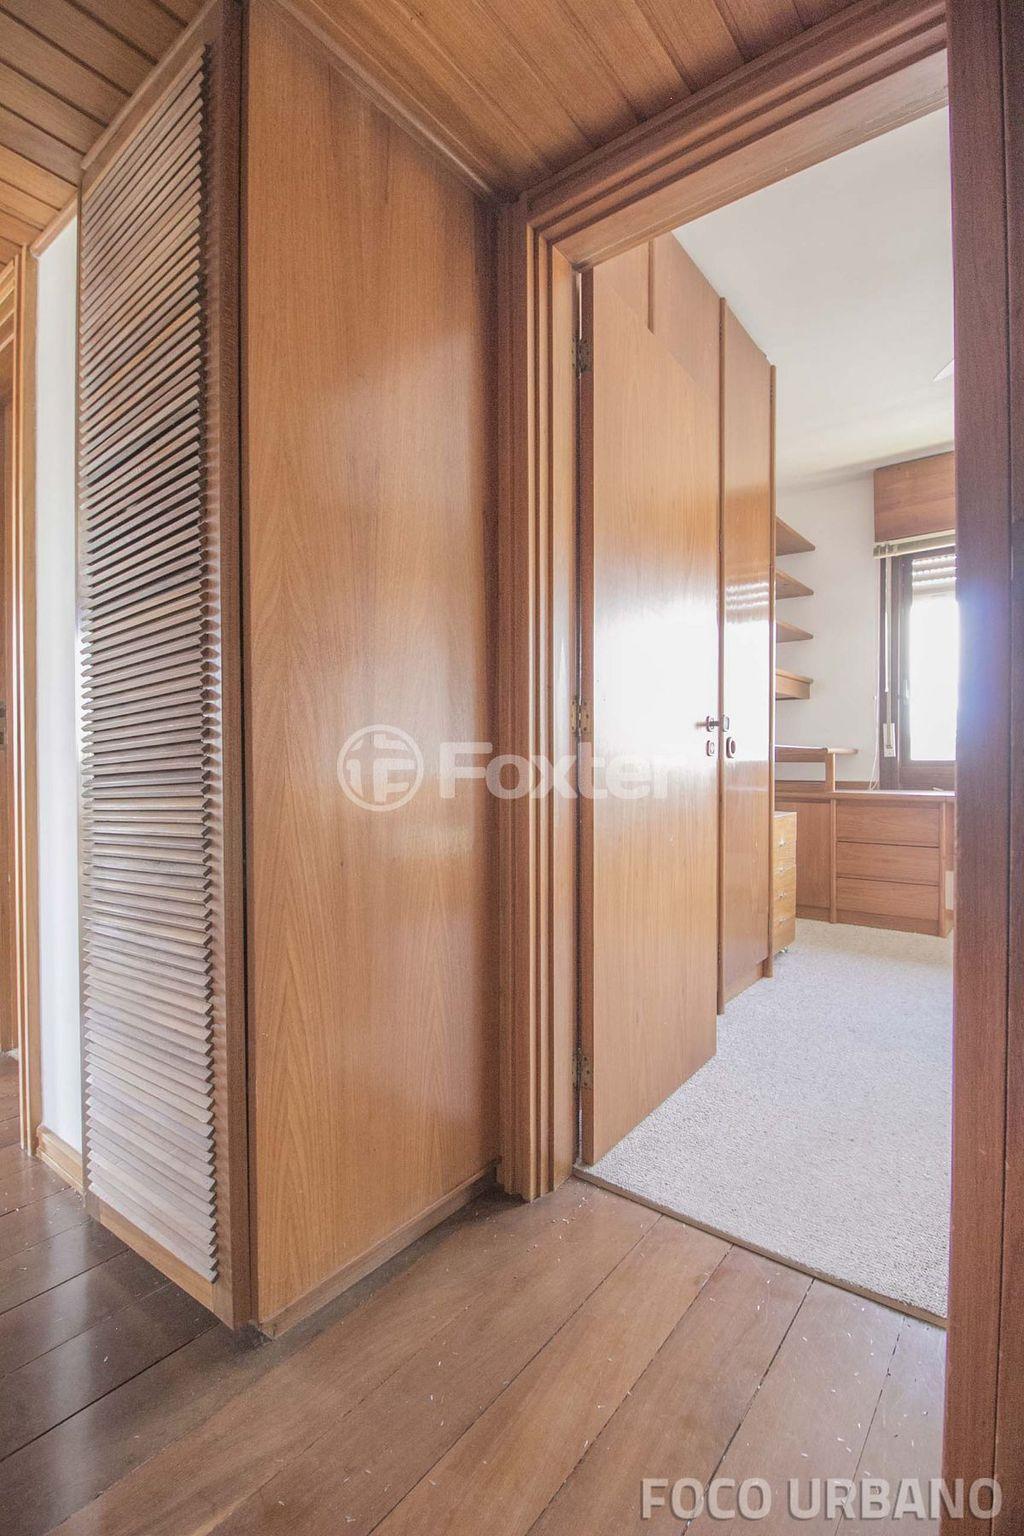 Cobertura 3 Dorm, Floresta, Porto Alegre (131891) - Foto 14